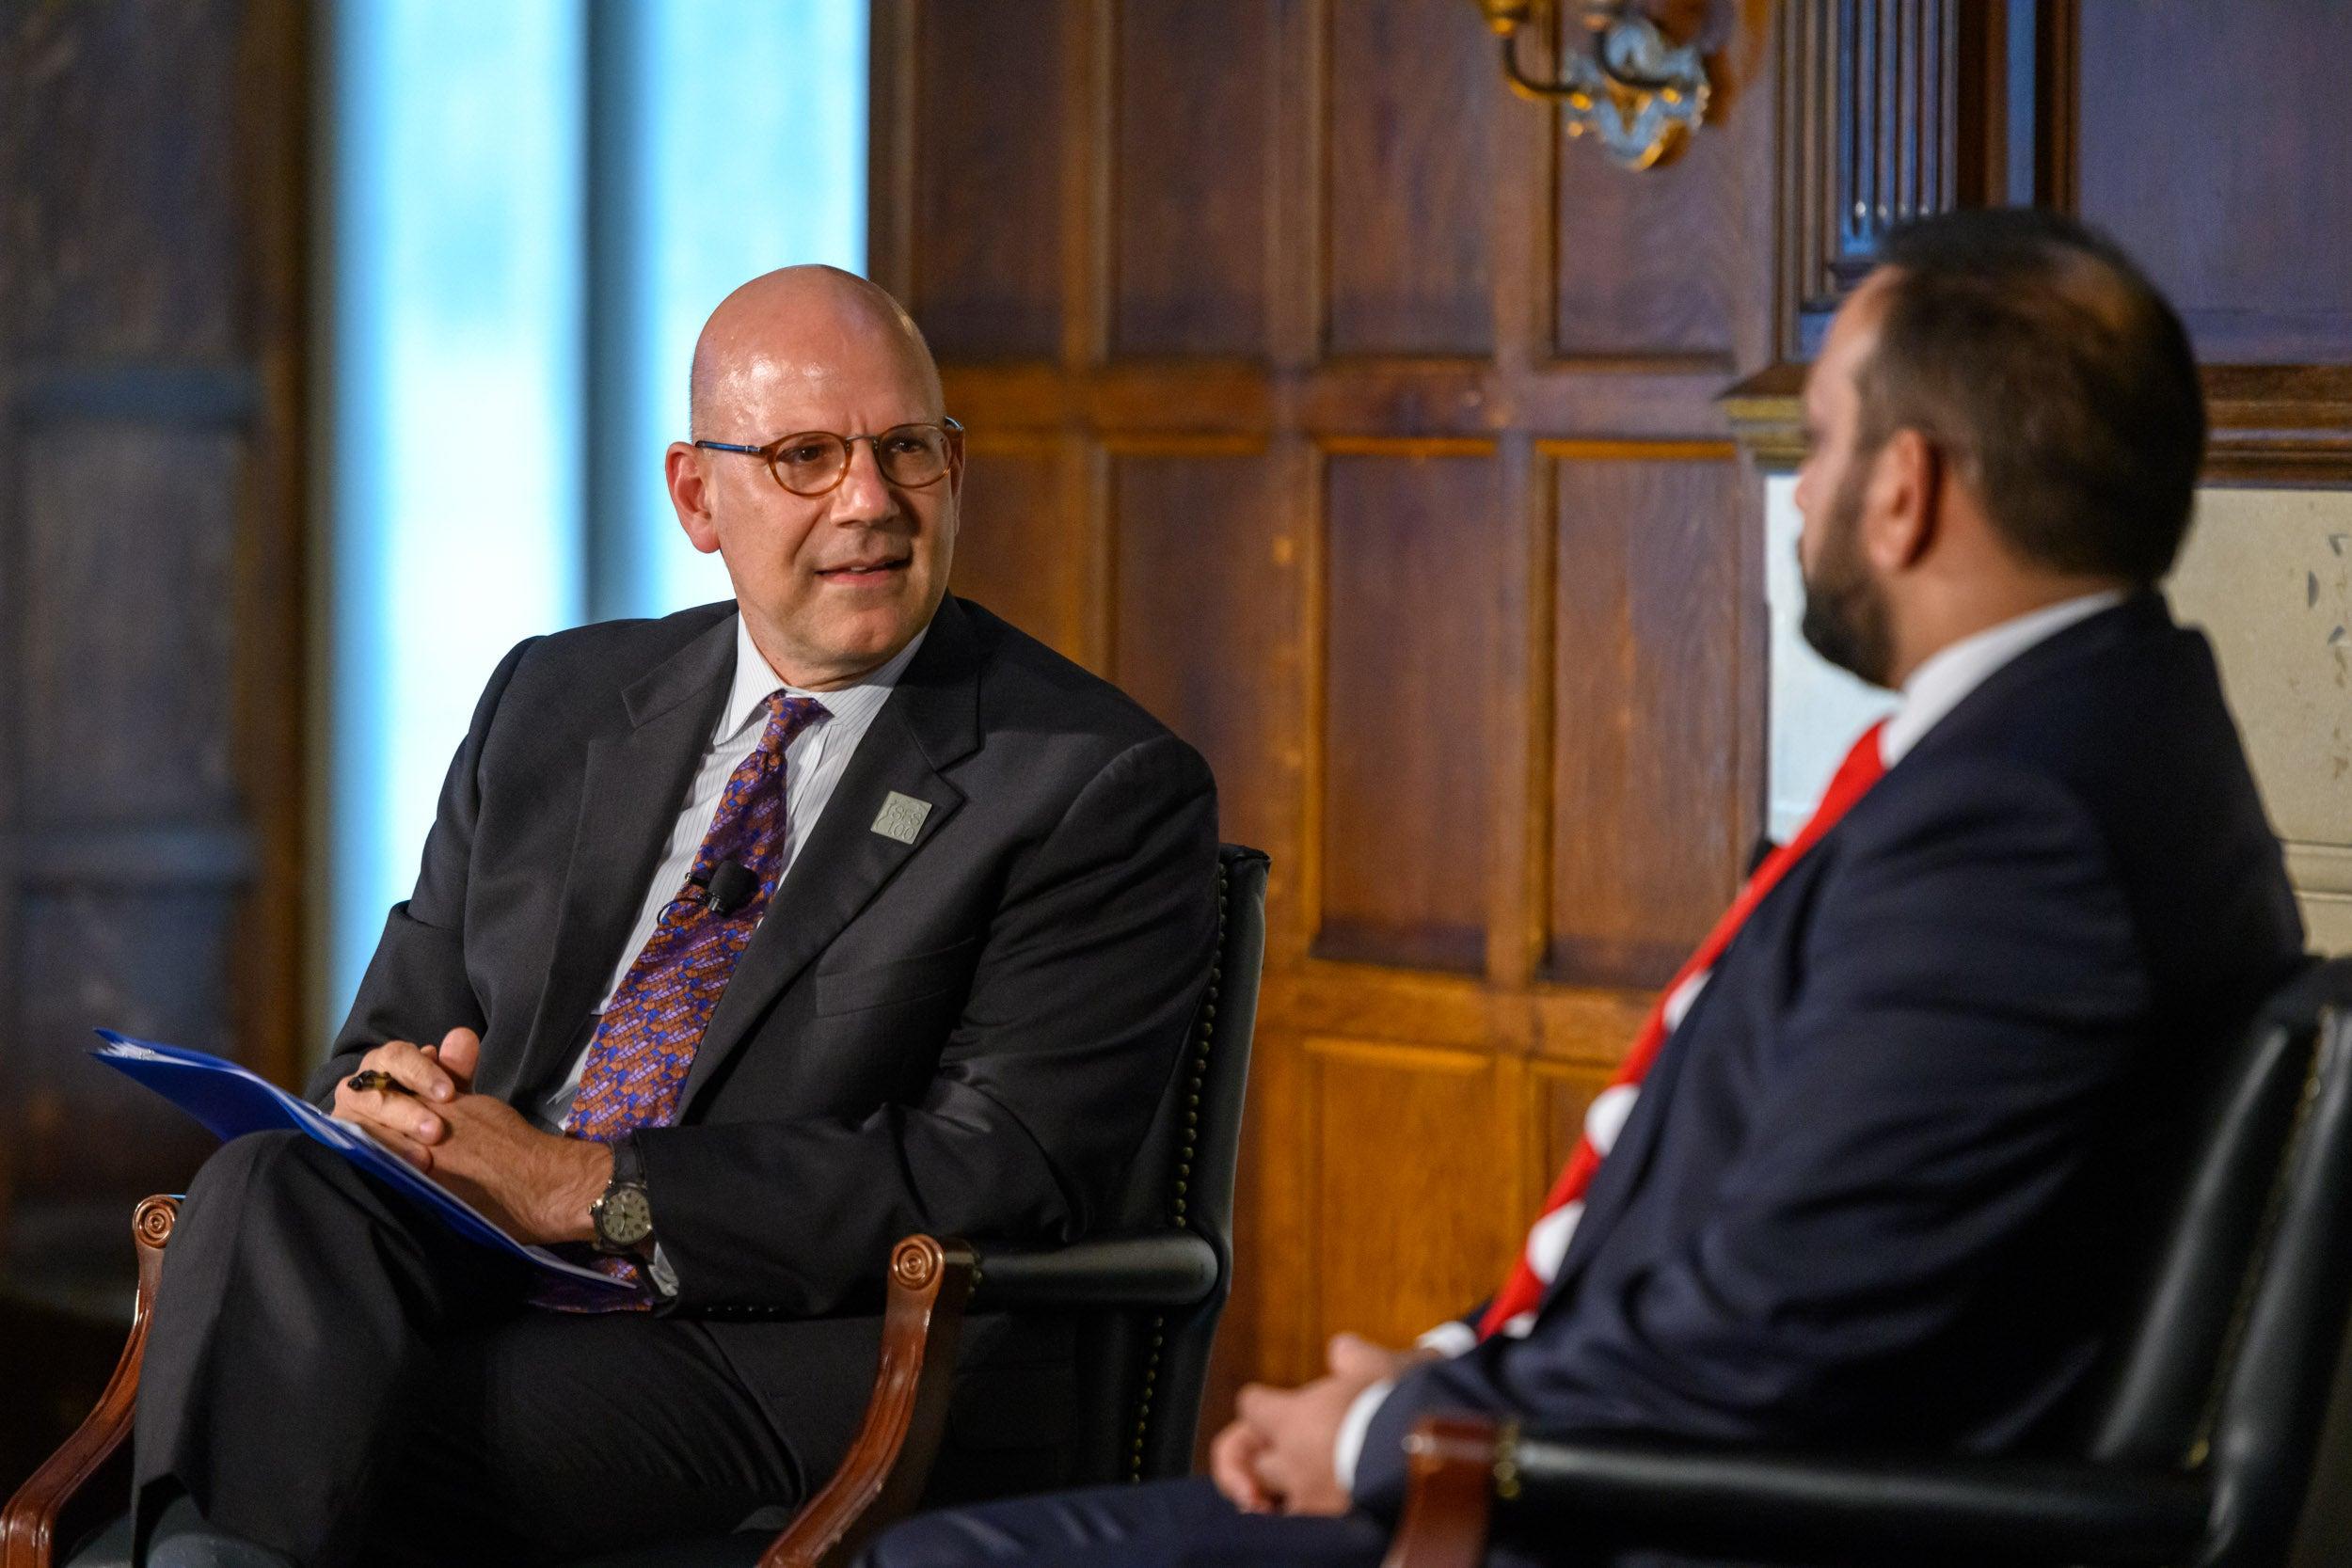 SFS Dean Joel Hellman, wearing a white shirt and purple faces former Afghan Finance Minister Khalid Payenda.